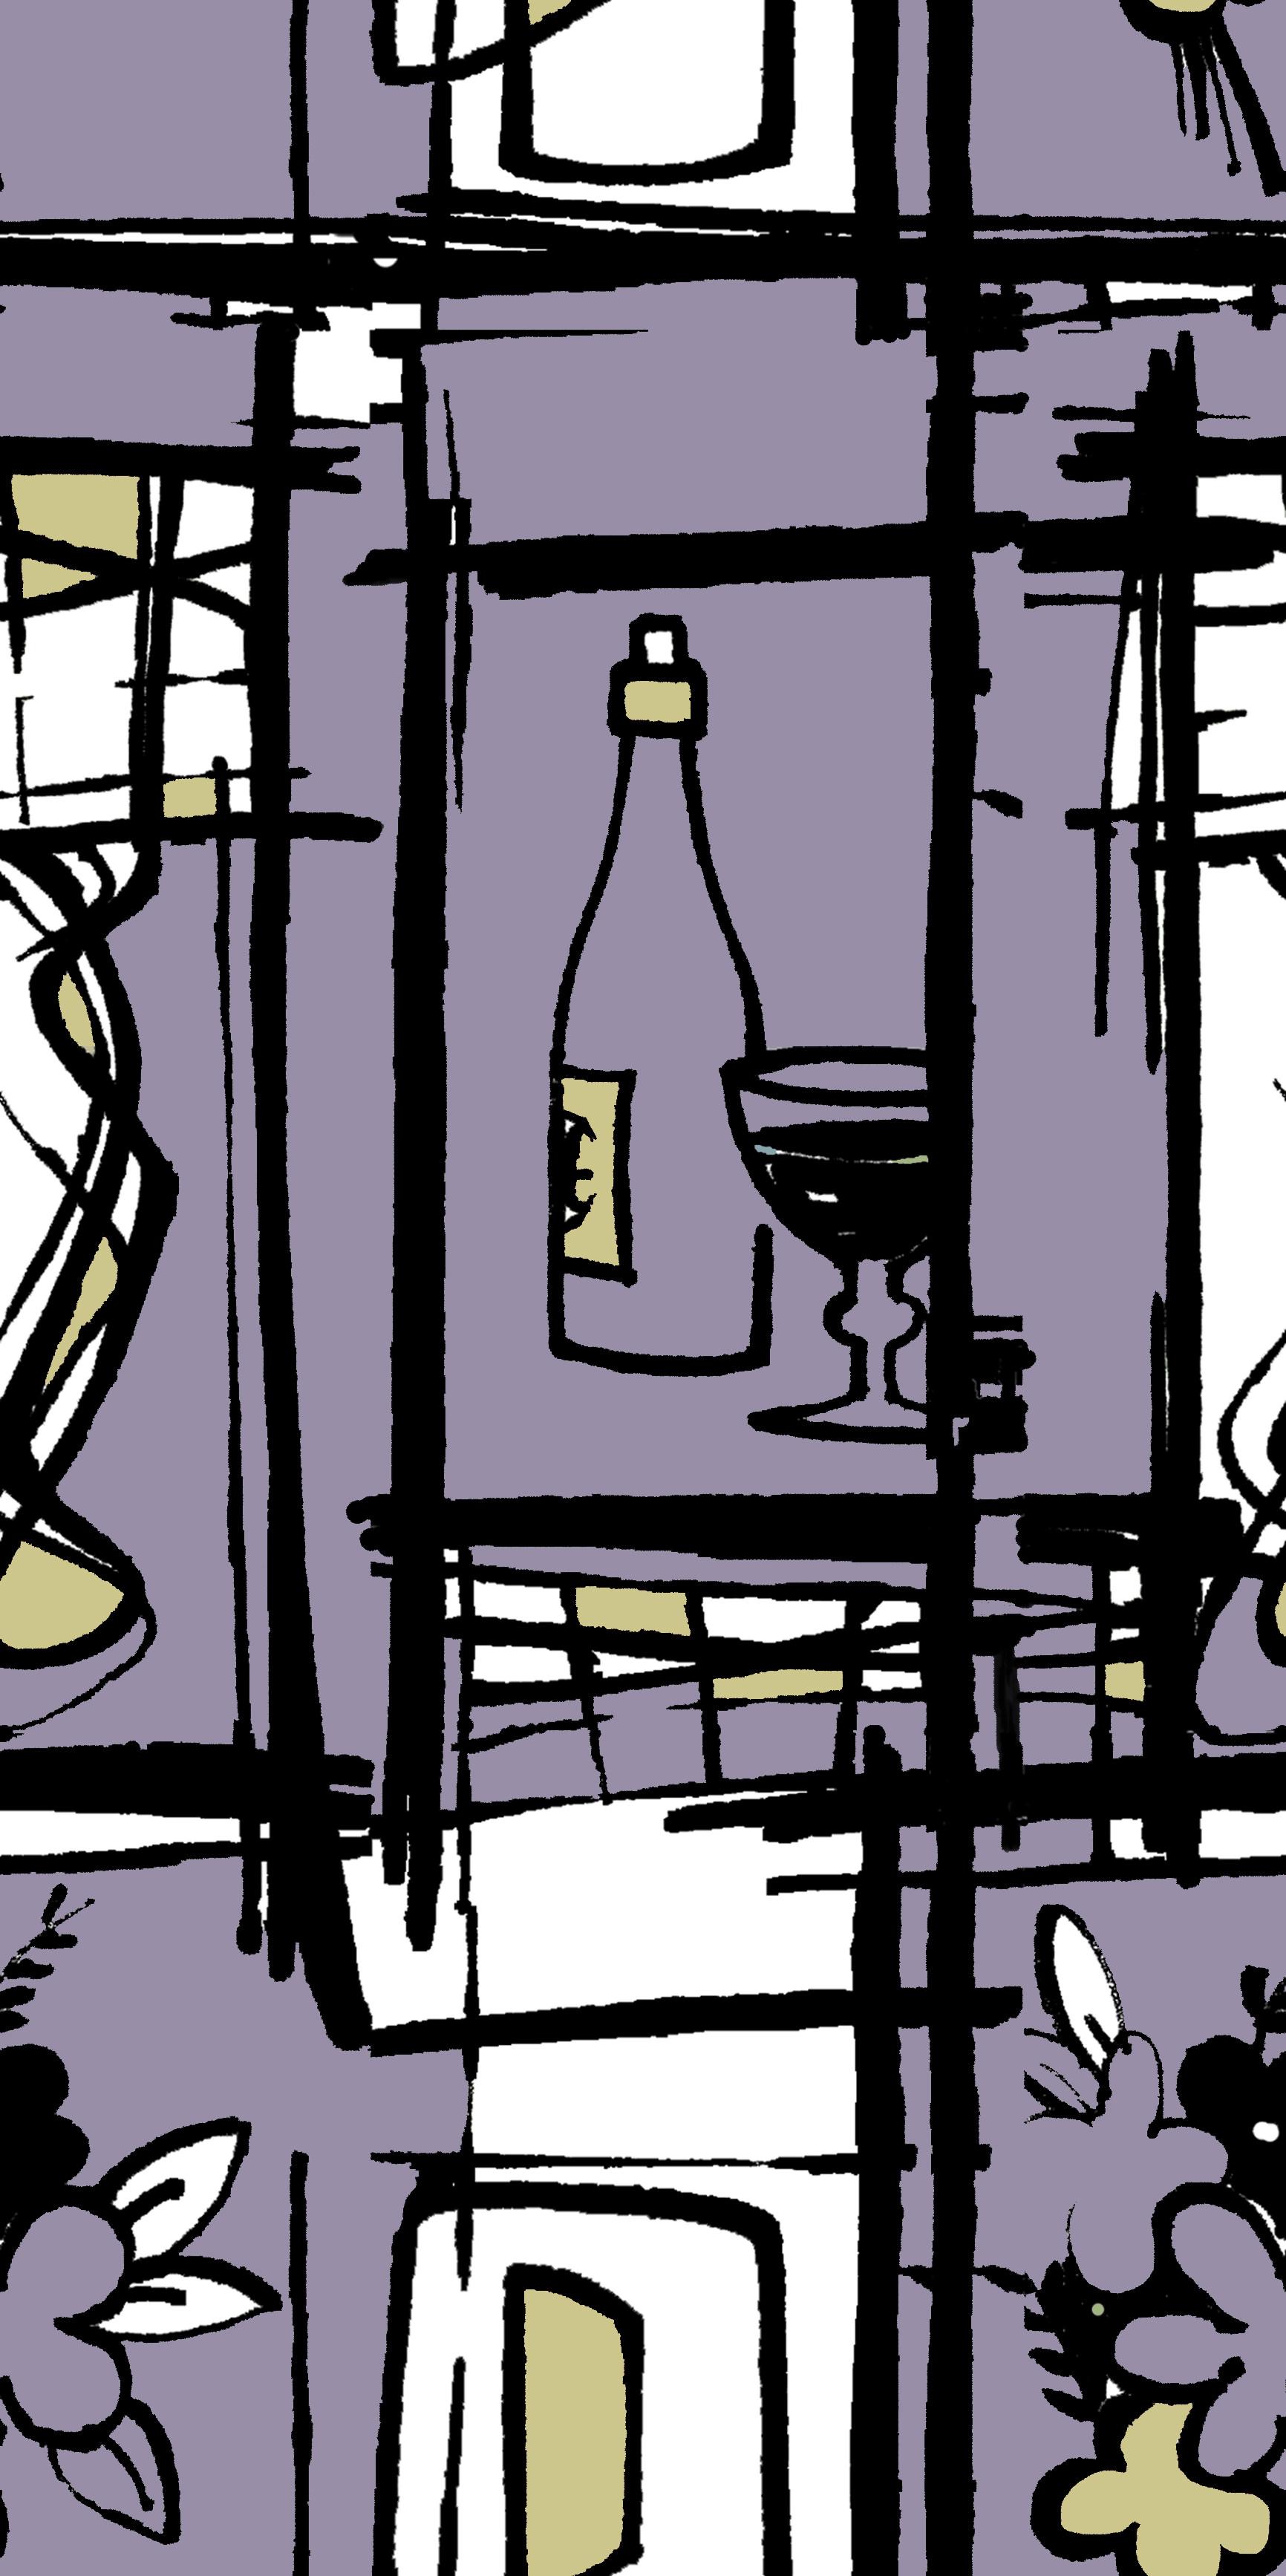 bottle and flowers design purple.jpg